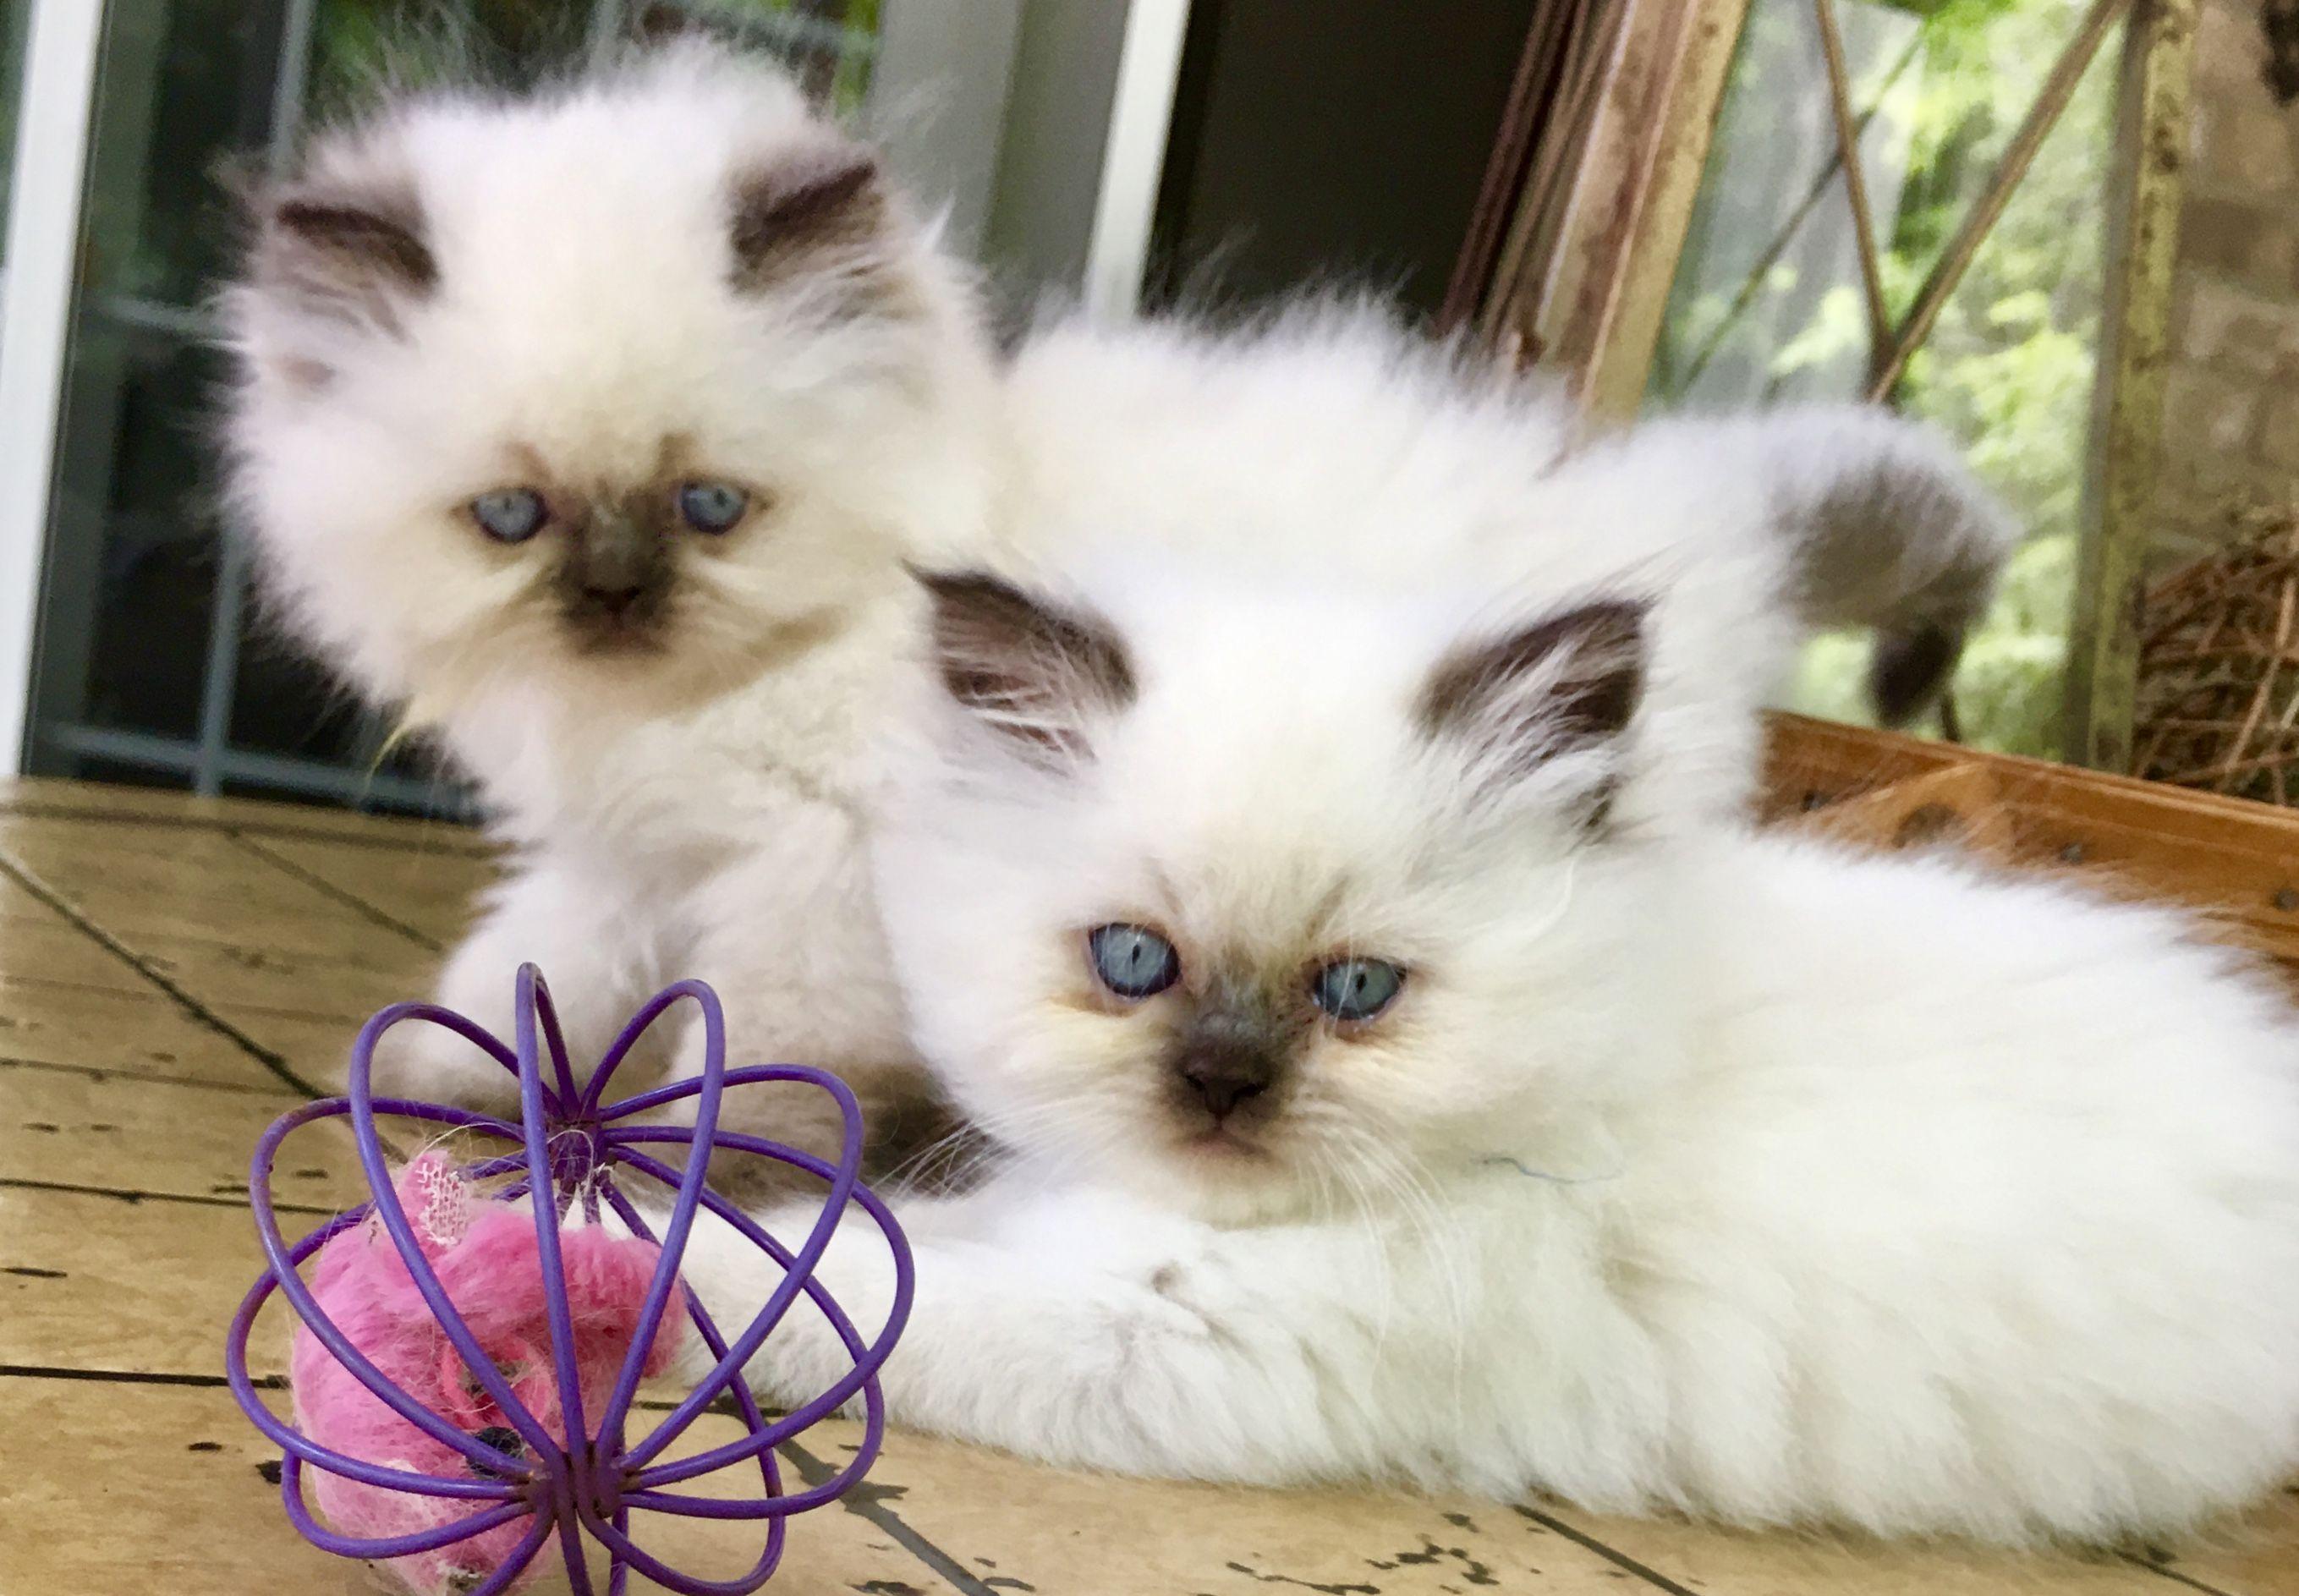 Powderpuff Persians Persian Kittens For Sale Persian Kittens Persian Kittens Cat Breeds Kitten Images